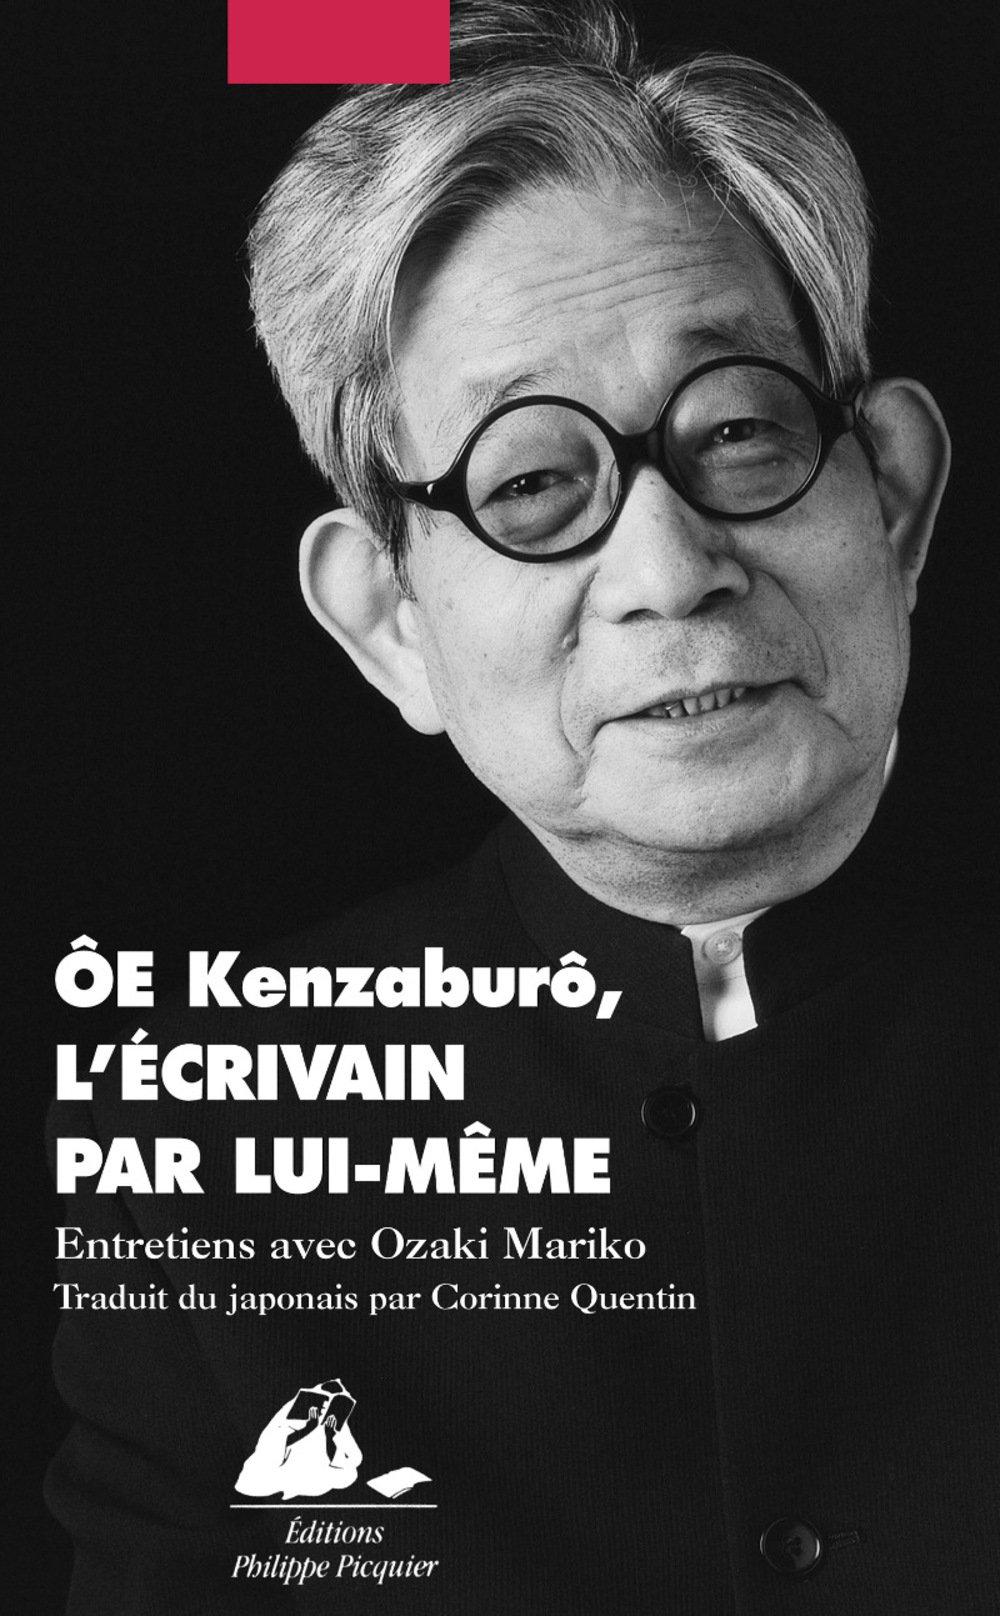 Oe Kenzaburo, l'ecrivain par lui-même par Ozaki Mariko